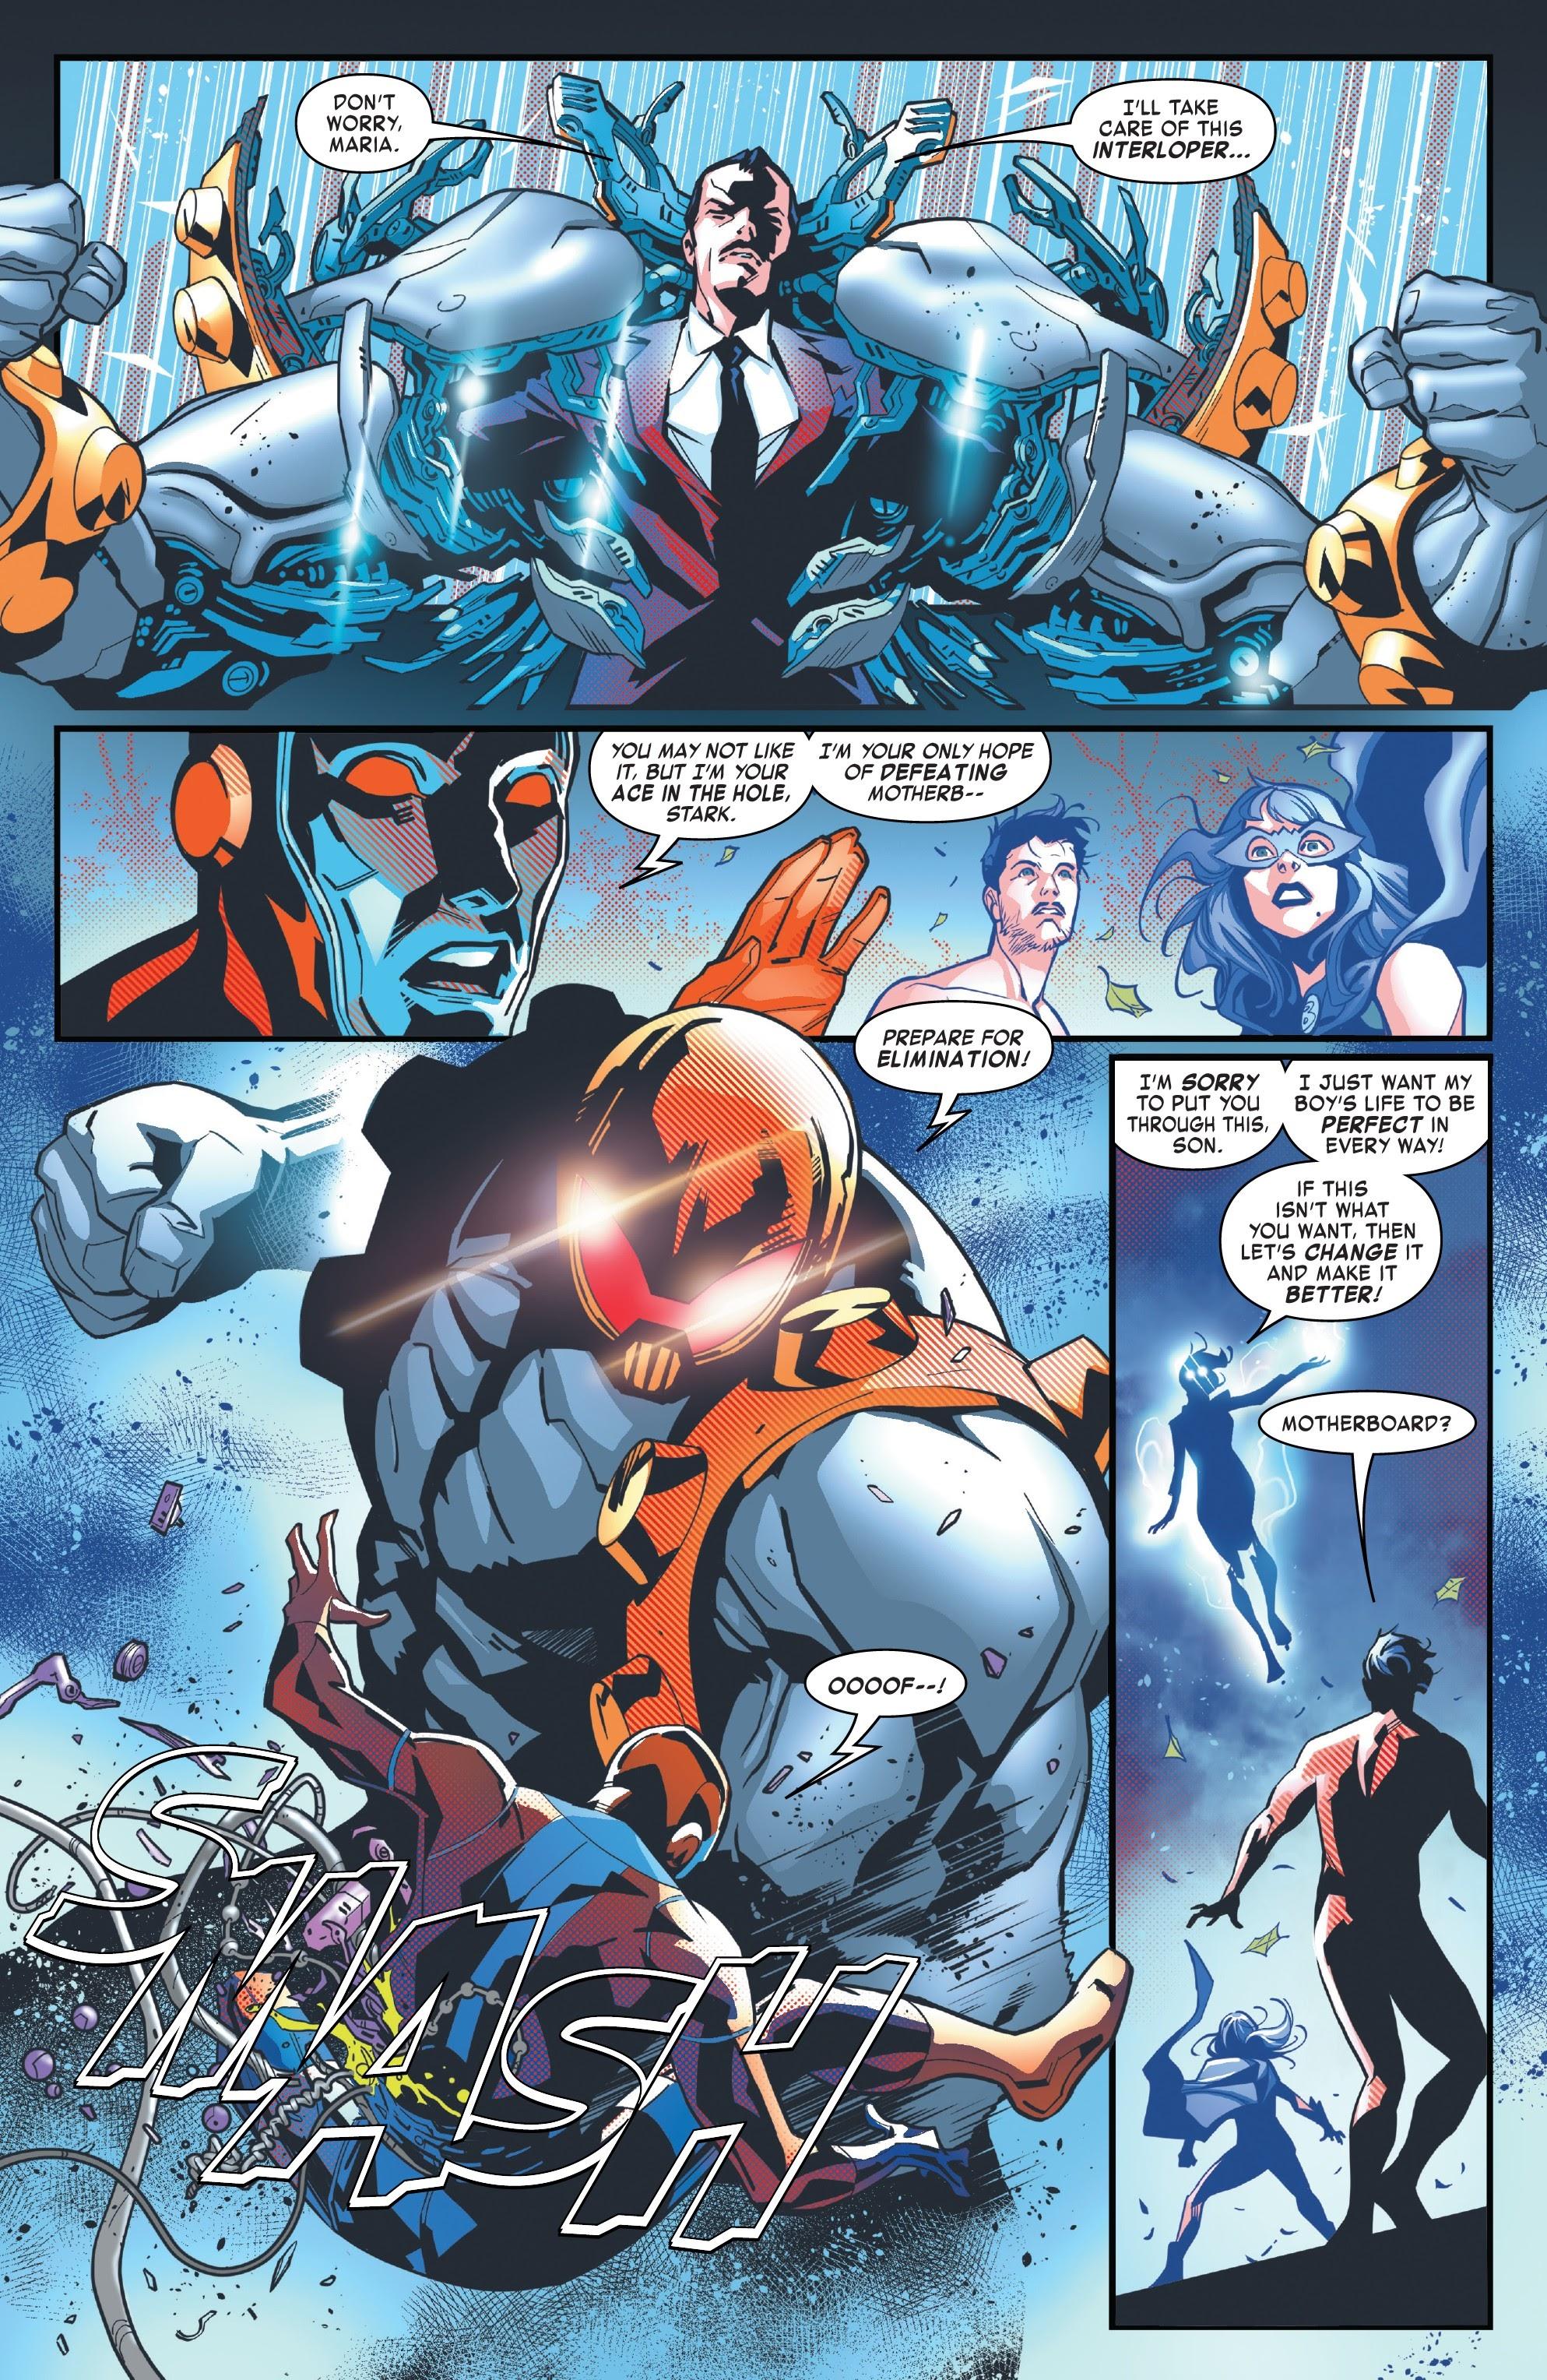 Read online Tony Stark: Iron Man comic -  Issue #10 - 8